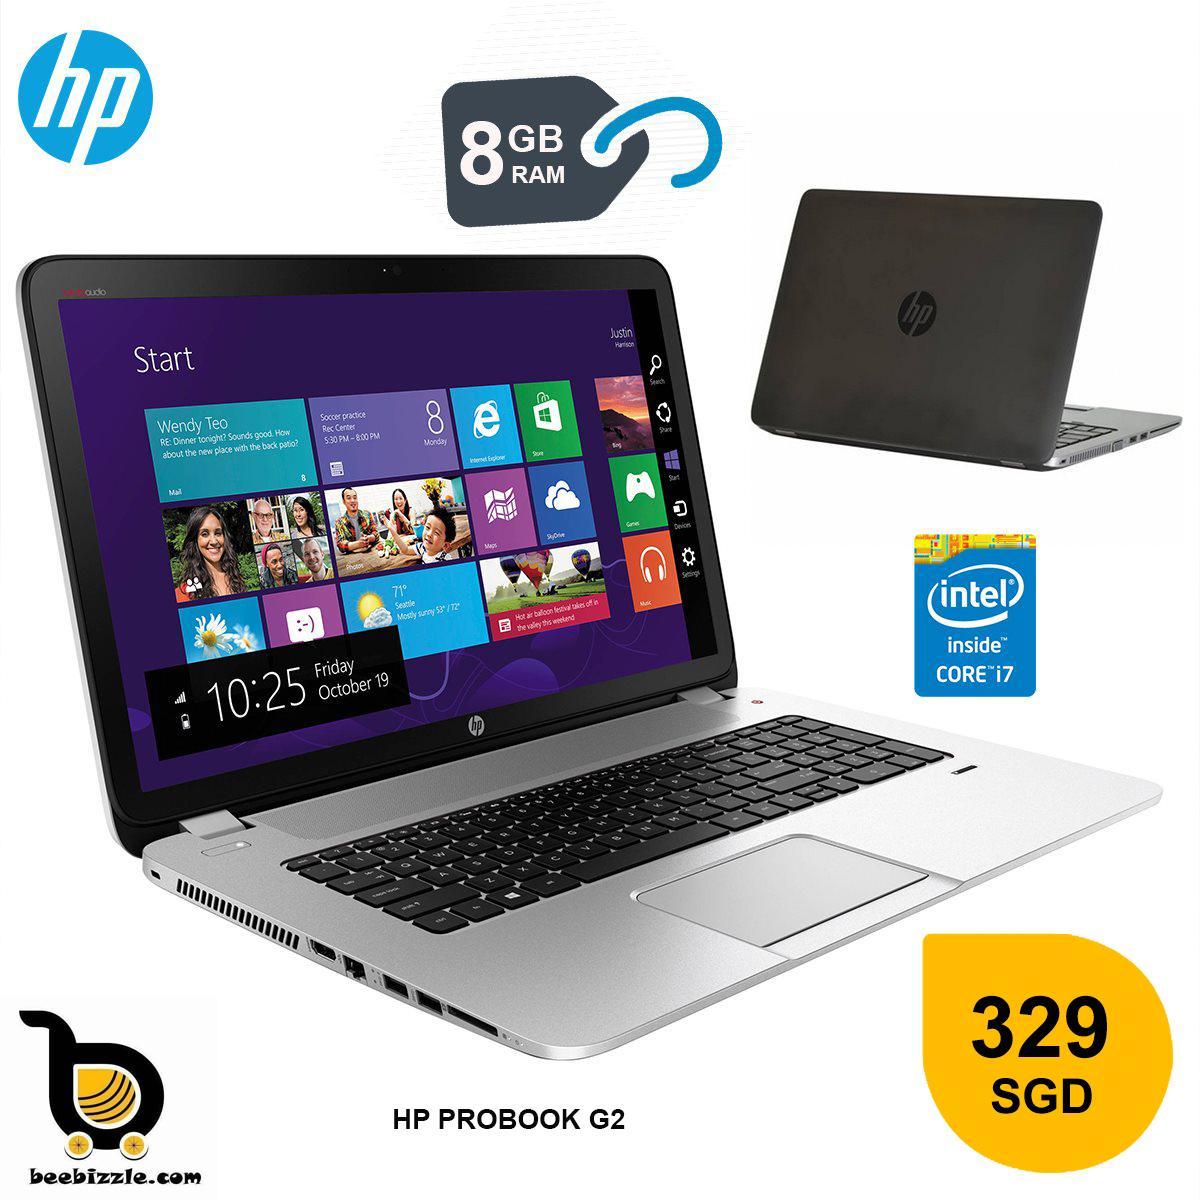 HP PROBOOK 430 (G2) INTEL CORE I7 PROCESSOR ( 13.3 INCH ) 8GB RAM AND MORE....